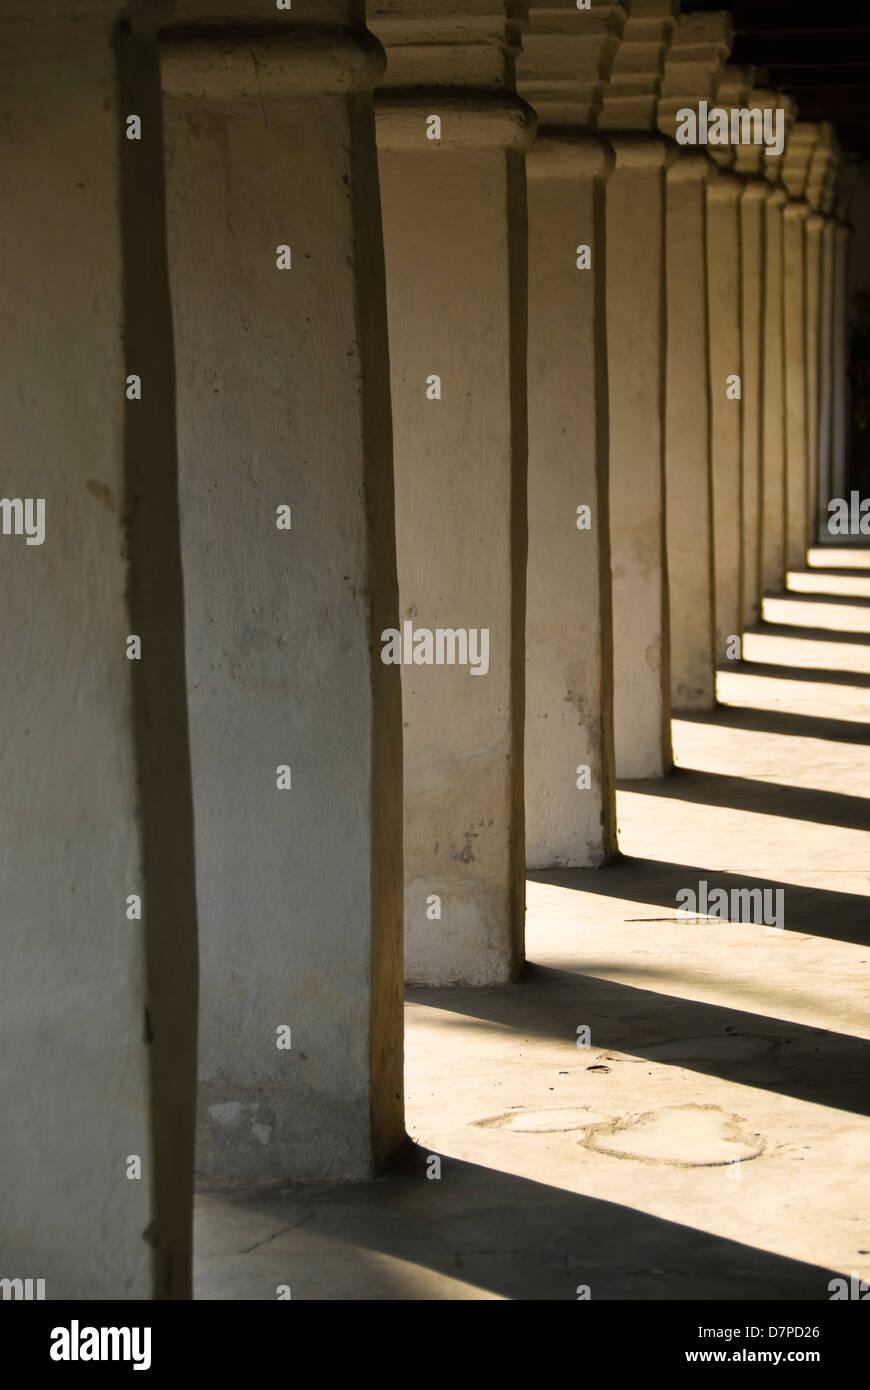 Saeulengang, Arcade - Stock Image